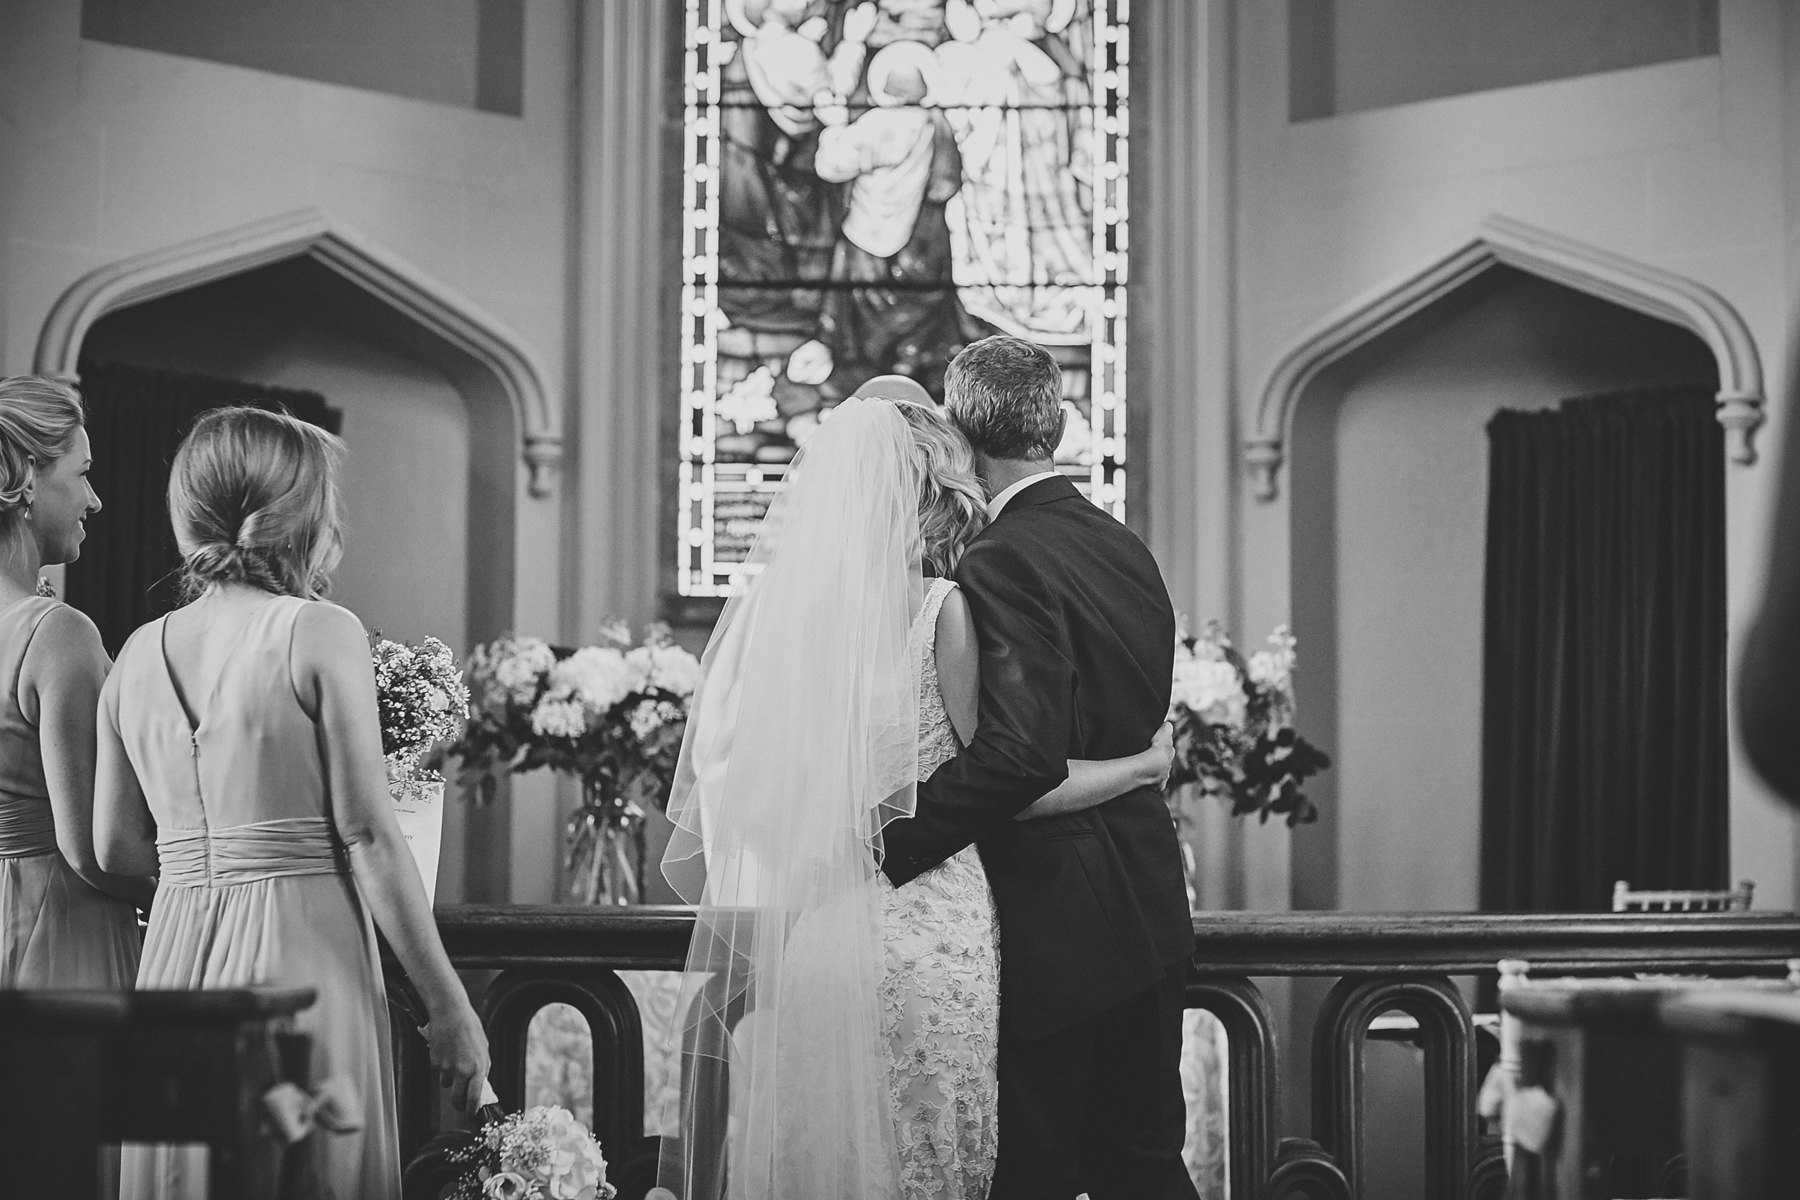 Wedding at Borris House co.Carlow 036 - Borris House wedding | Cara & David